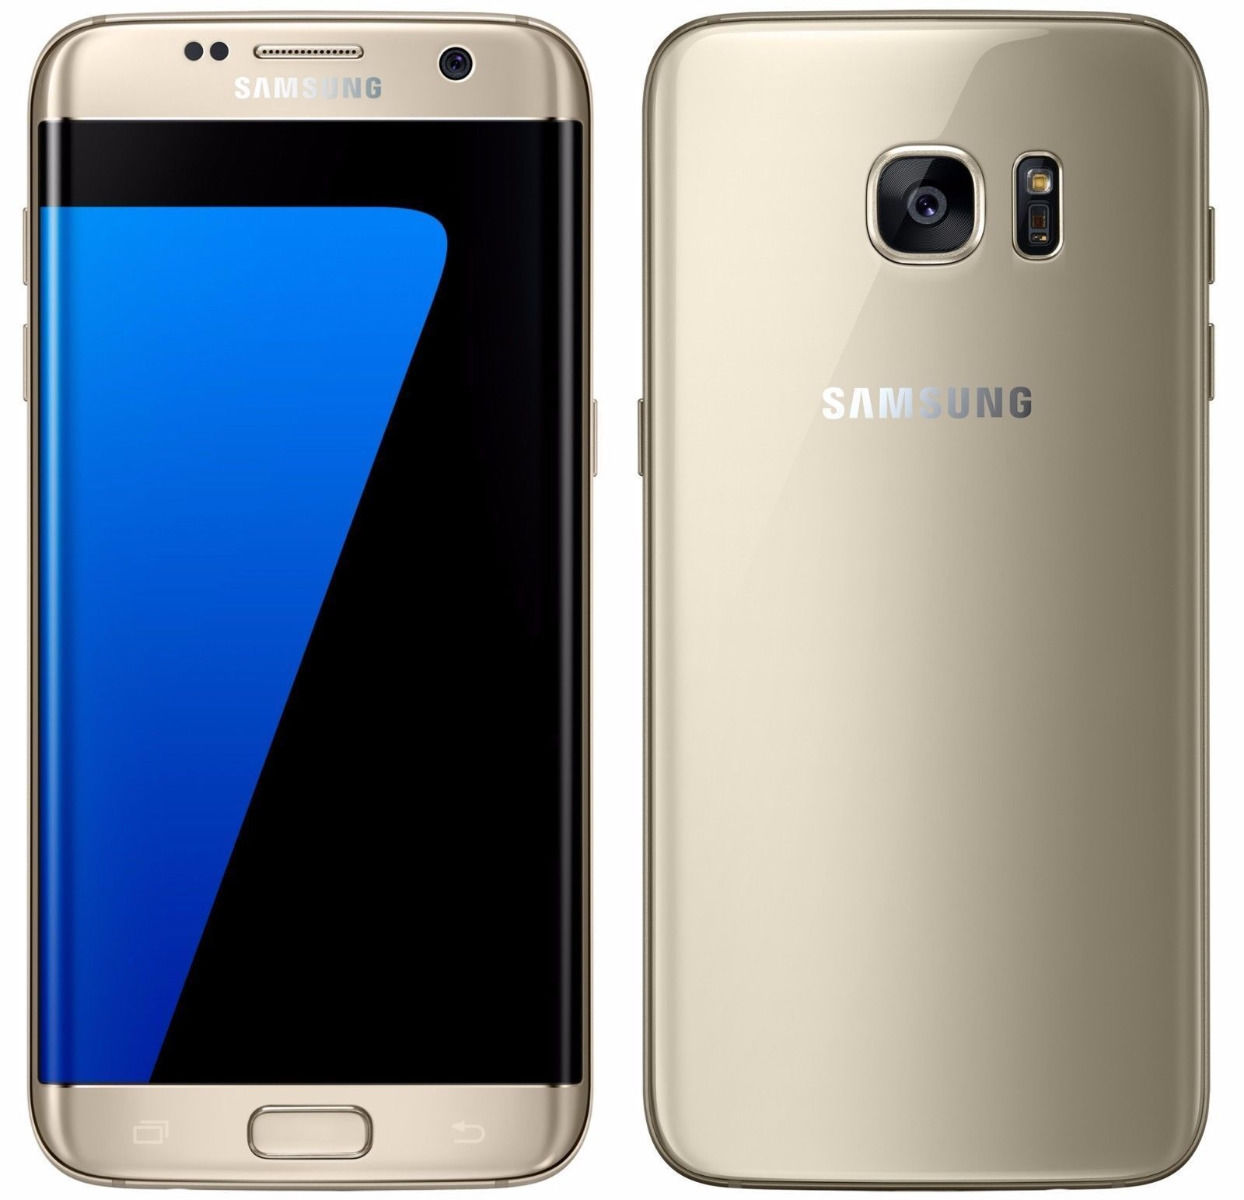 Samsung Galaxy S7 Edge 32GB SM-G935T Unlocked GSM 4G LTE Android Smartphone